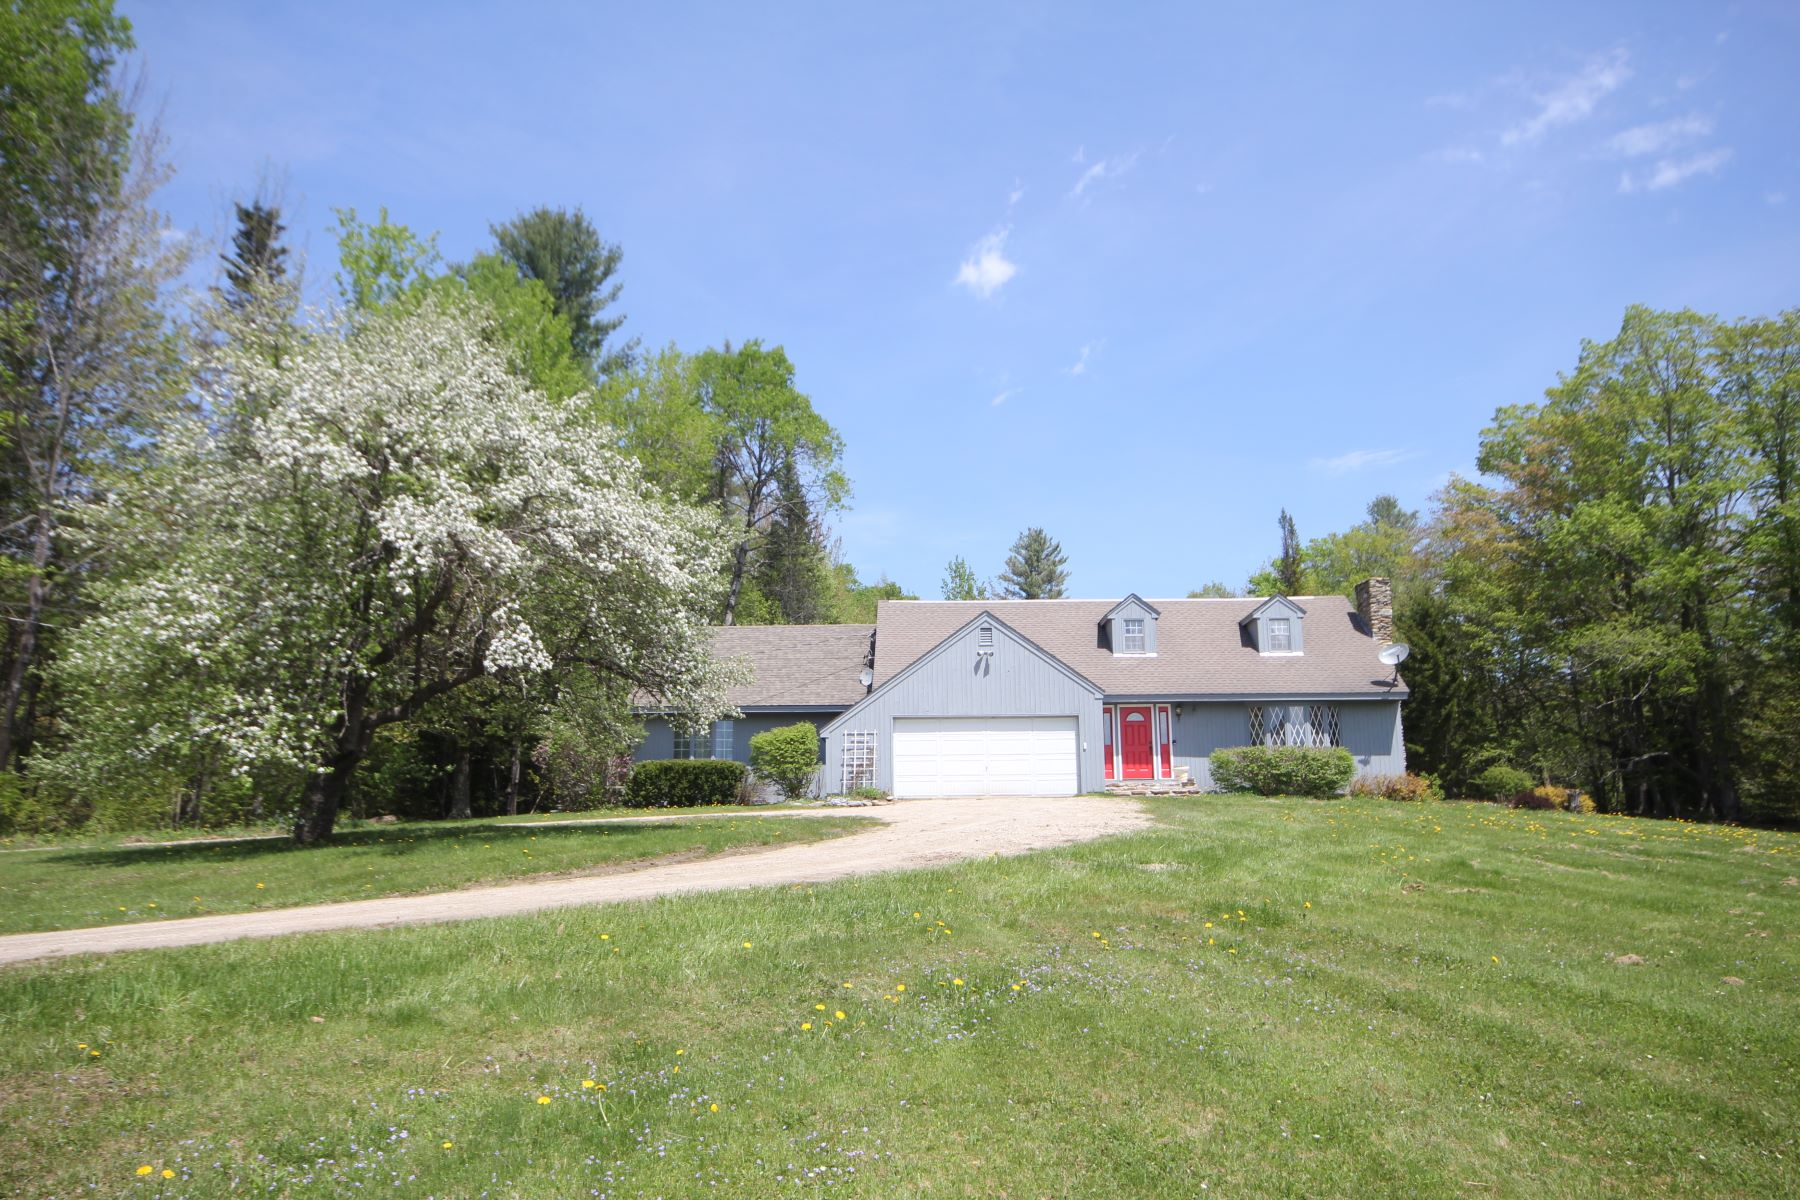 Частный односемейный дом для того Продажа на Lovely House on Four Acres with Pond 16 Valley Vw, Landgrove, Вермонт, 05148 Соединенные Штаты